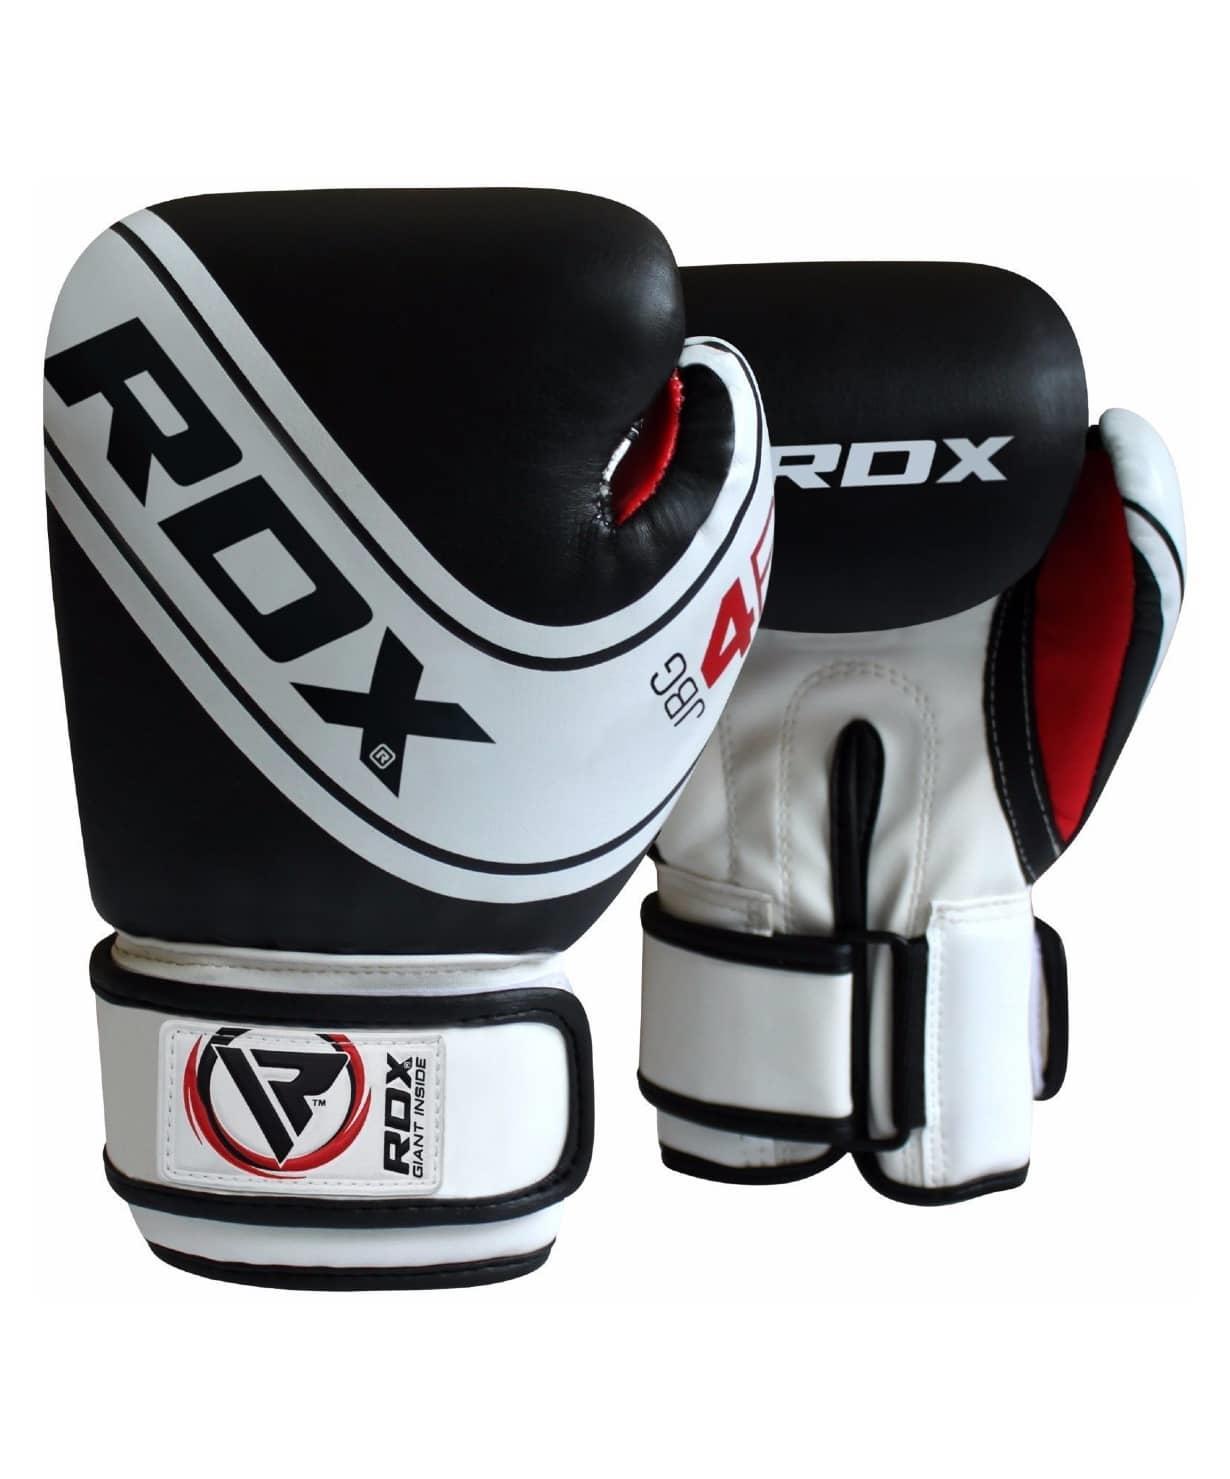 Перчатки боксерские KIDS WHITE/BLACK JBG-4B-6oz, 6 oz